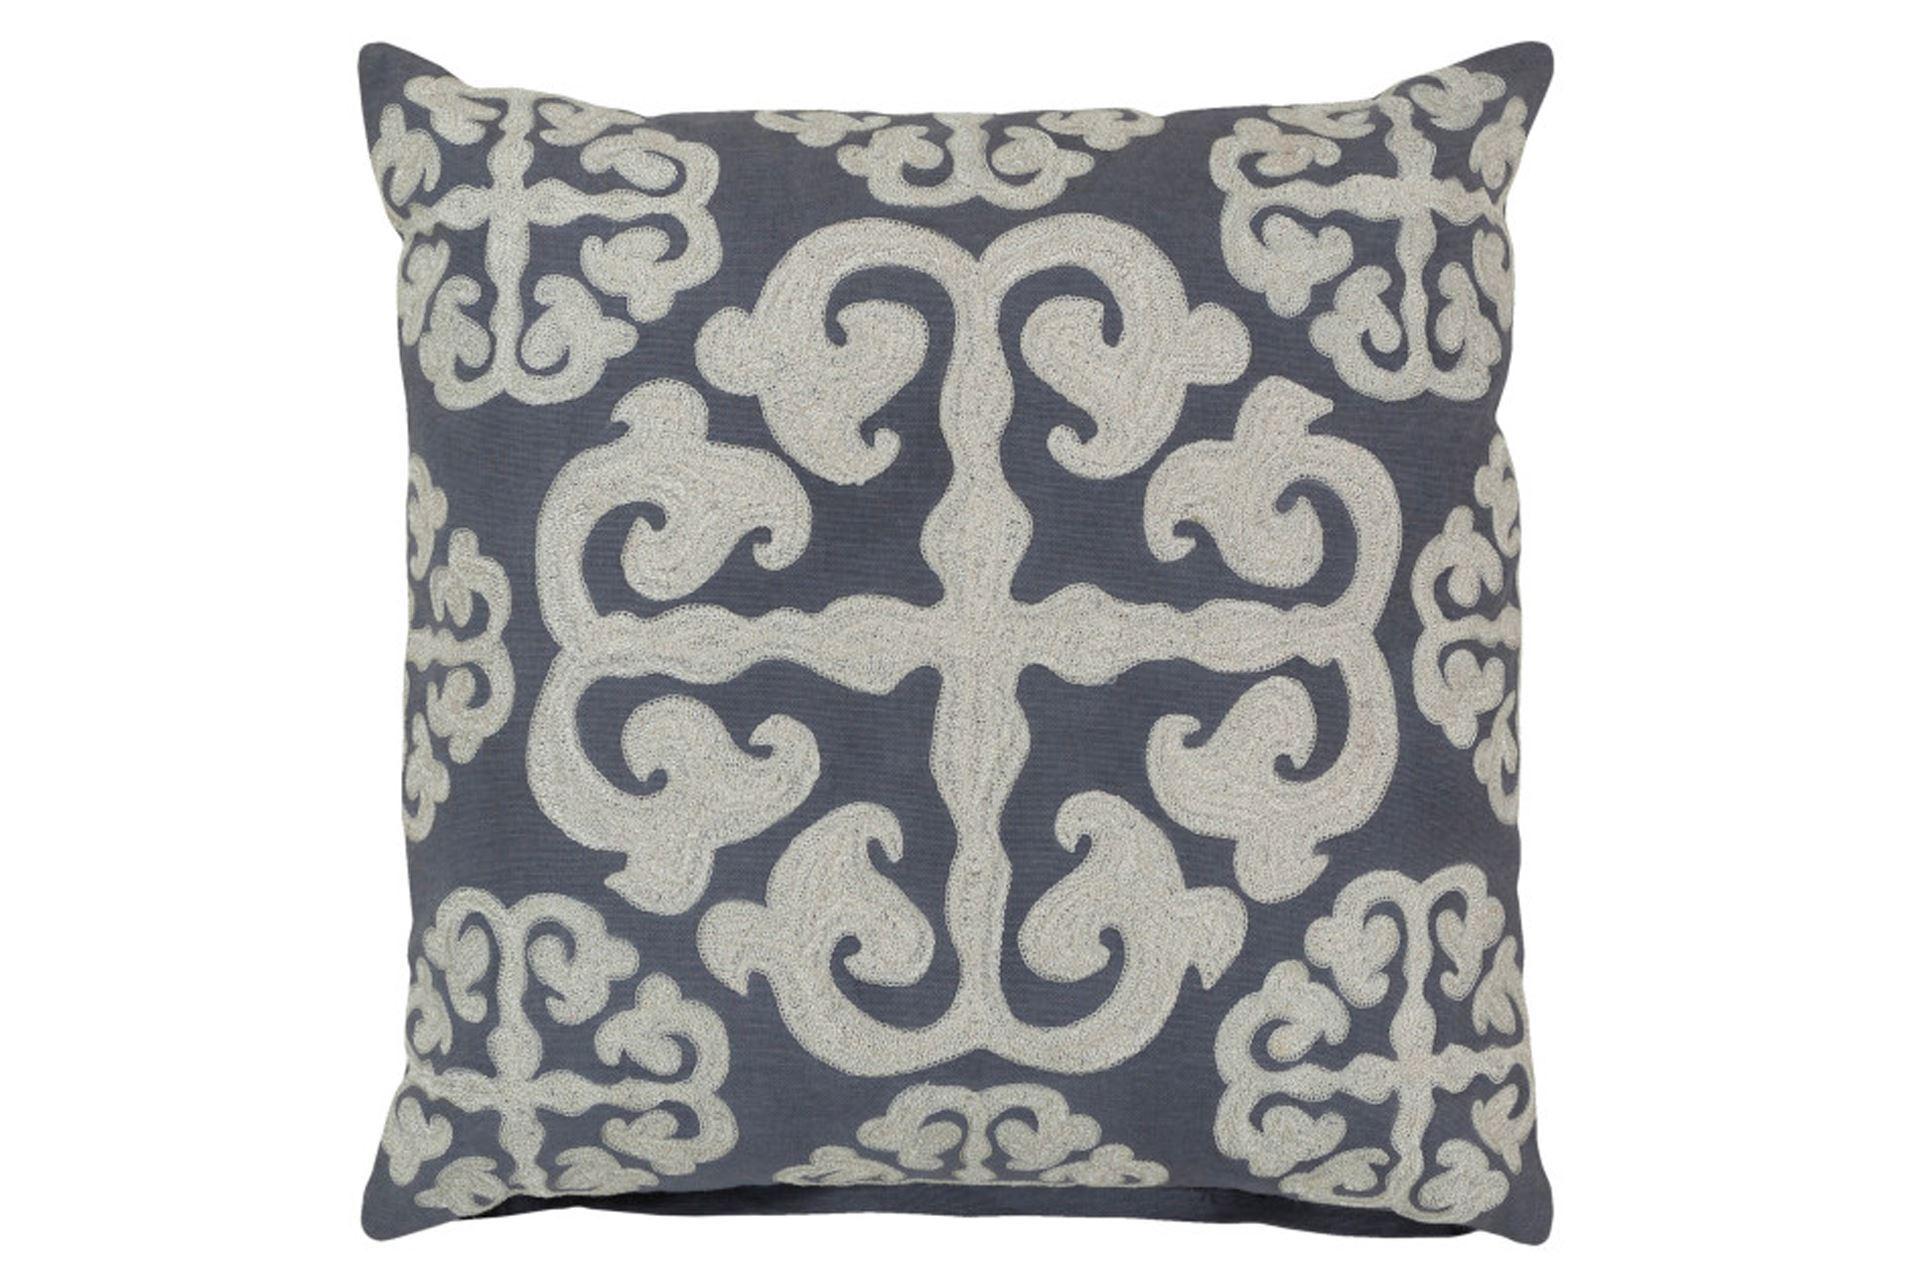 Decorative Pillows Living Spaces : Accent Pillow-Lorena Grey 22X22 - Living Spaces